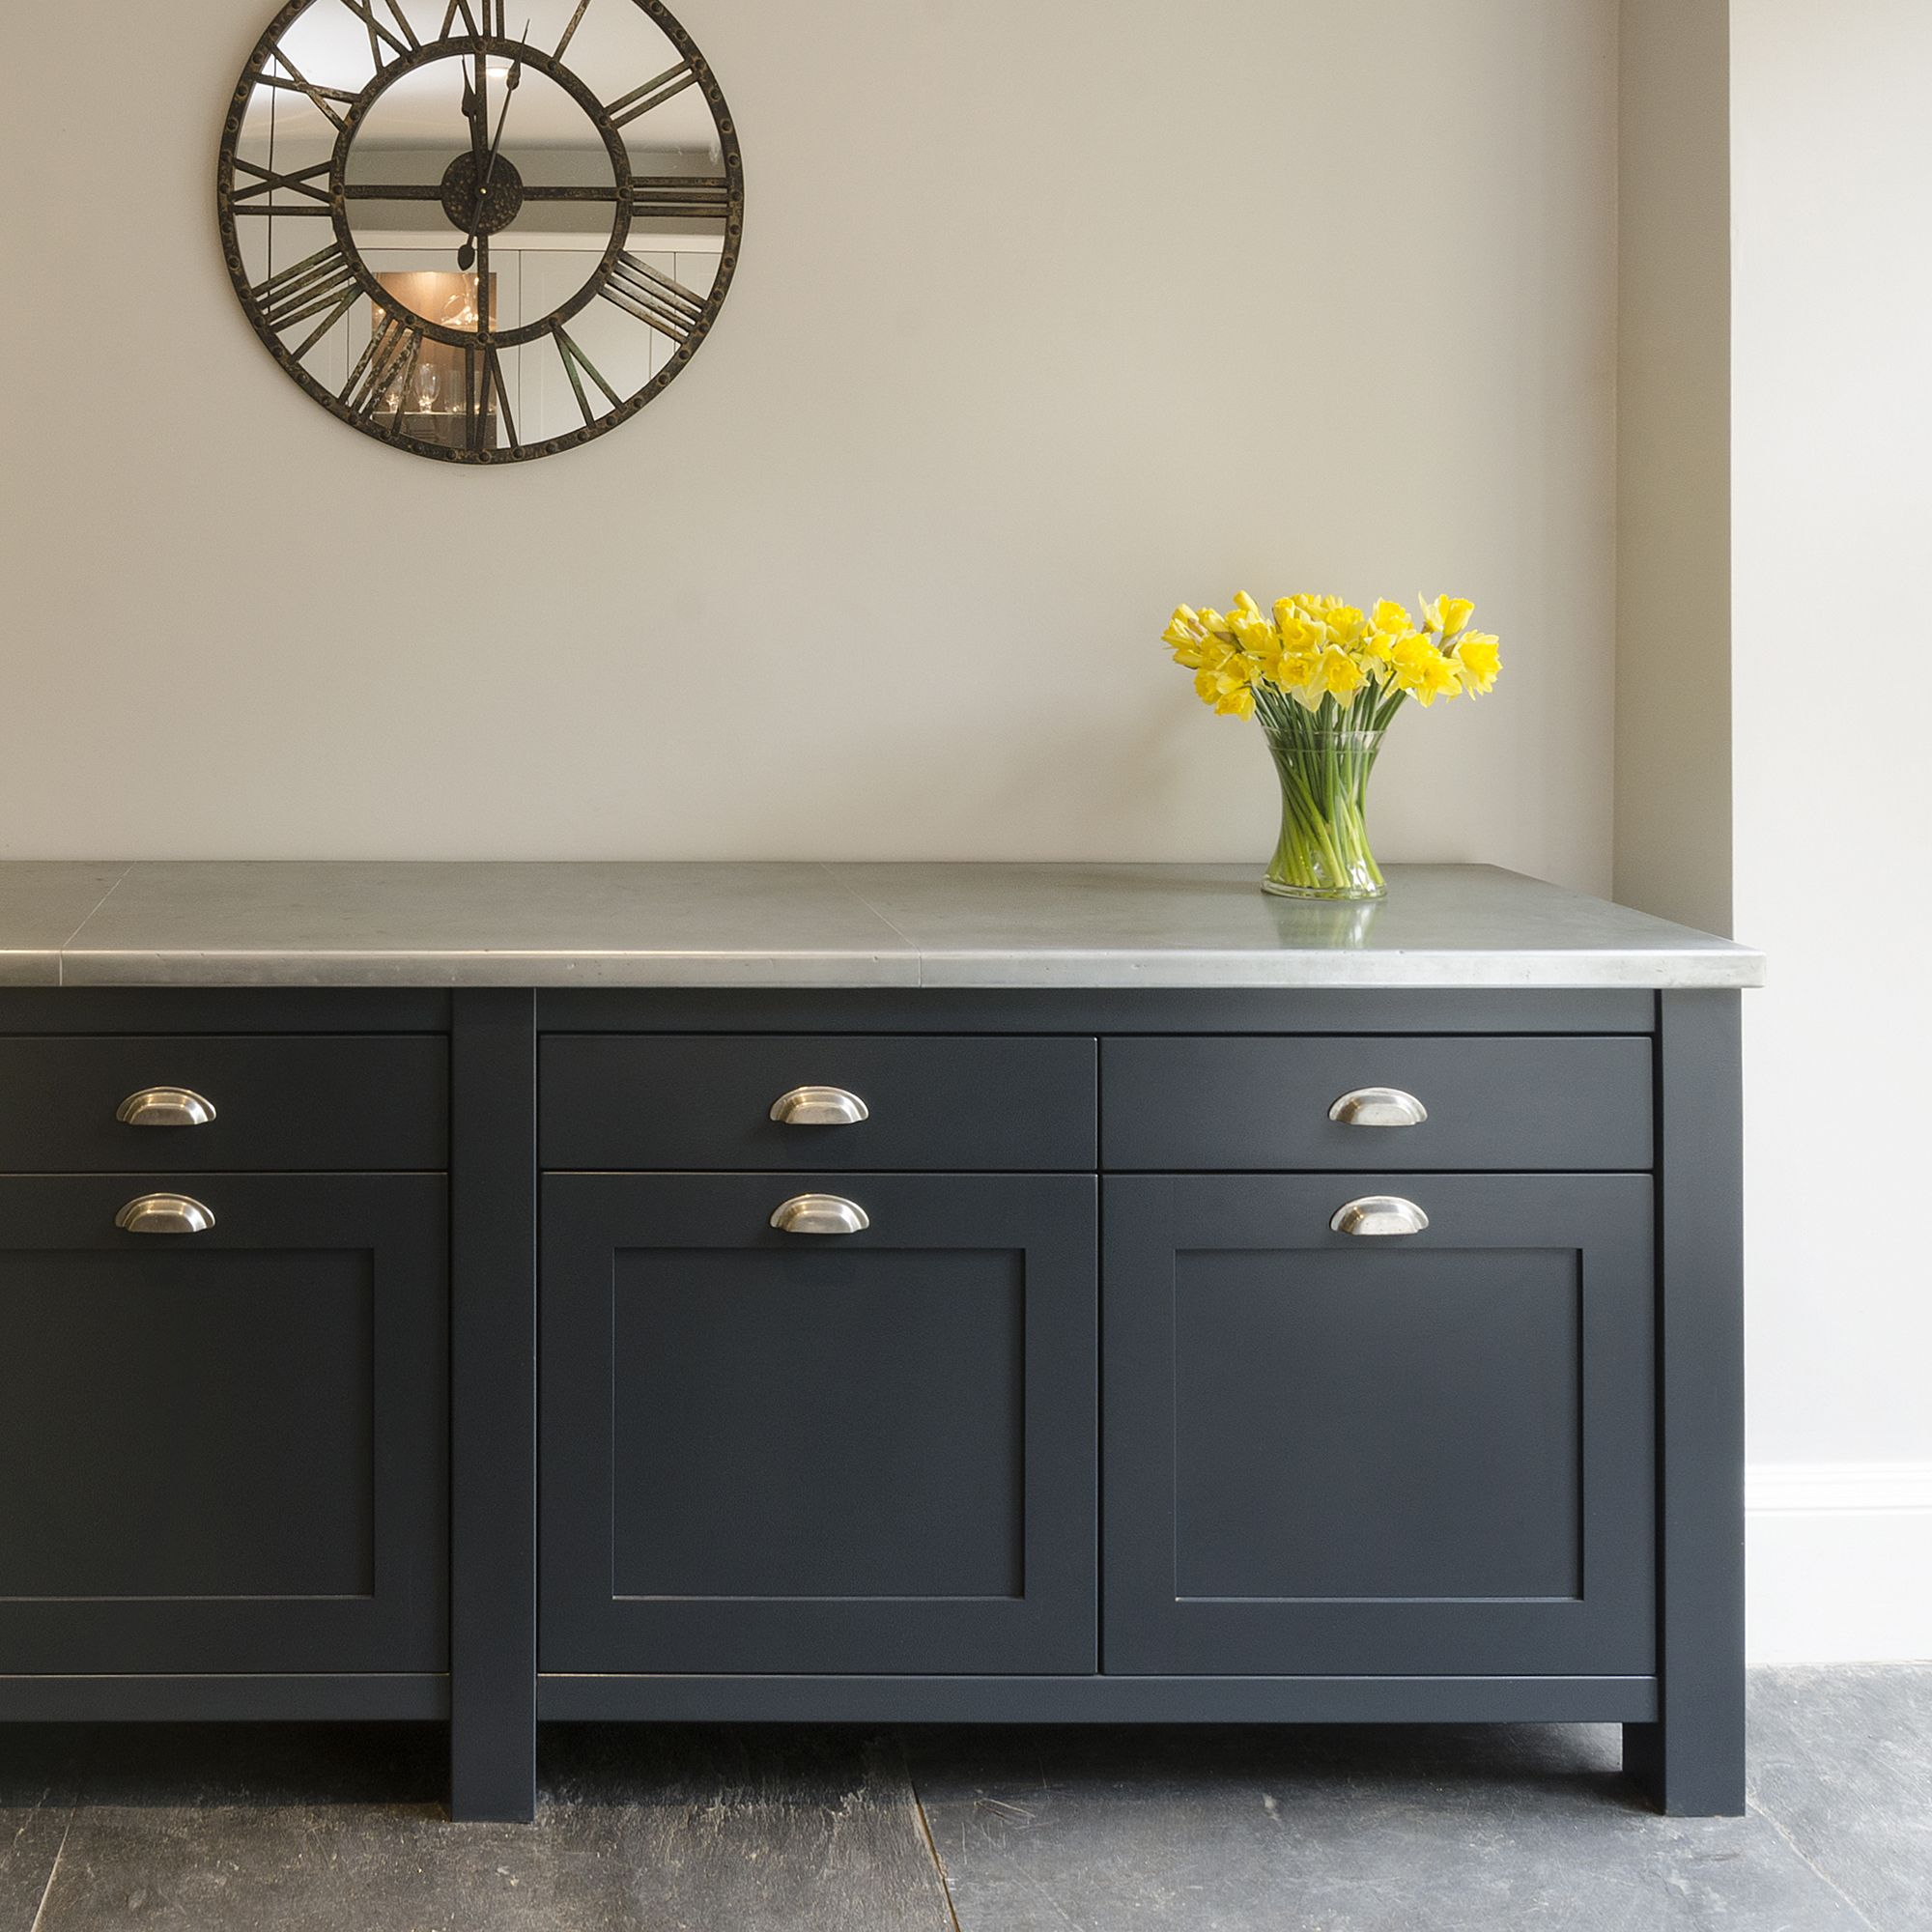 Farrow And Ball Railings Paint farrow & ball 'railings' painted shaker furniture with hand